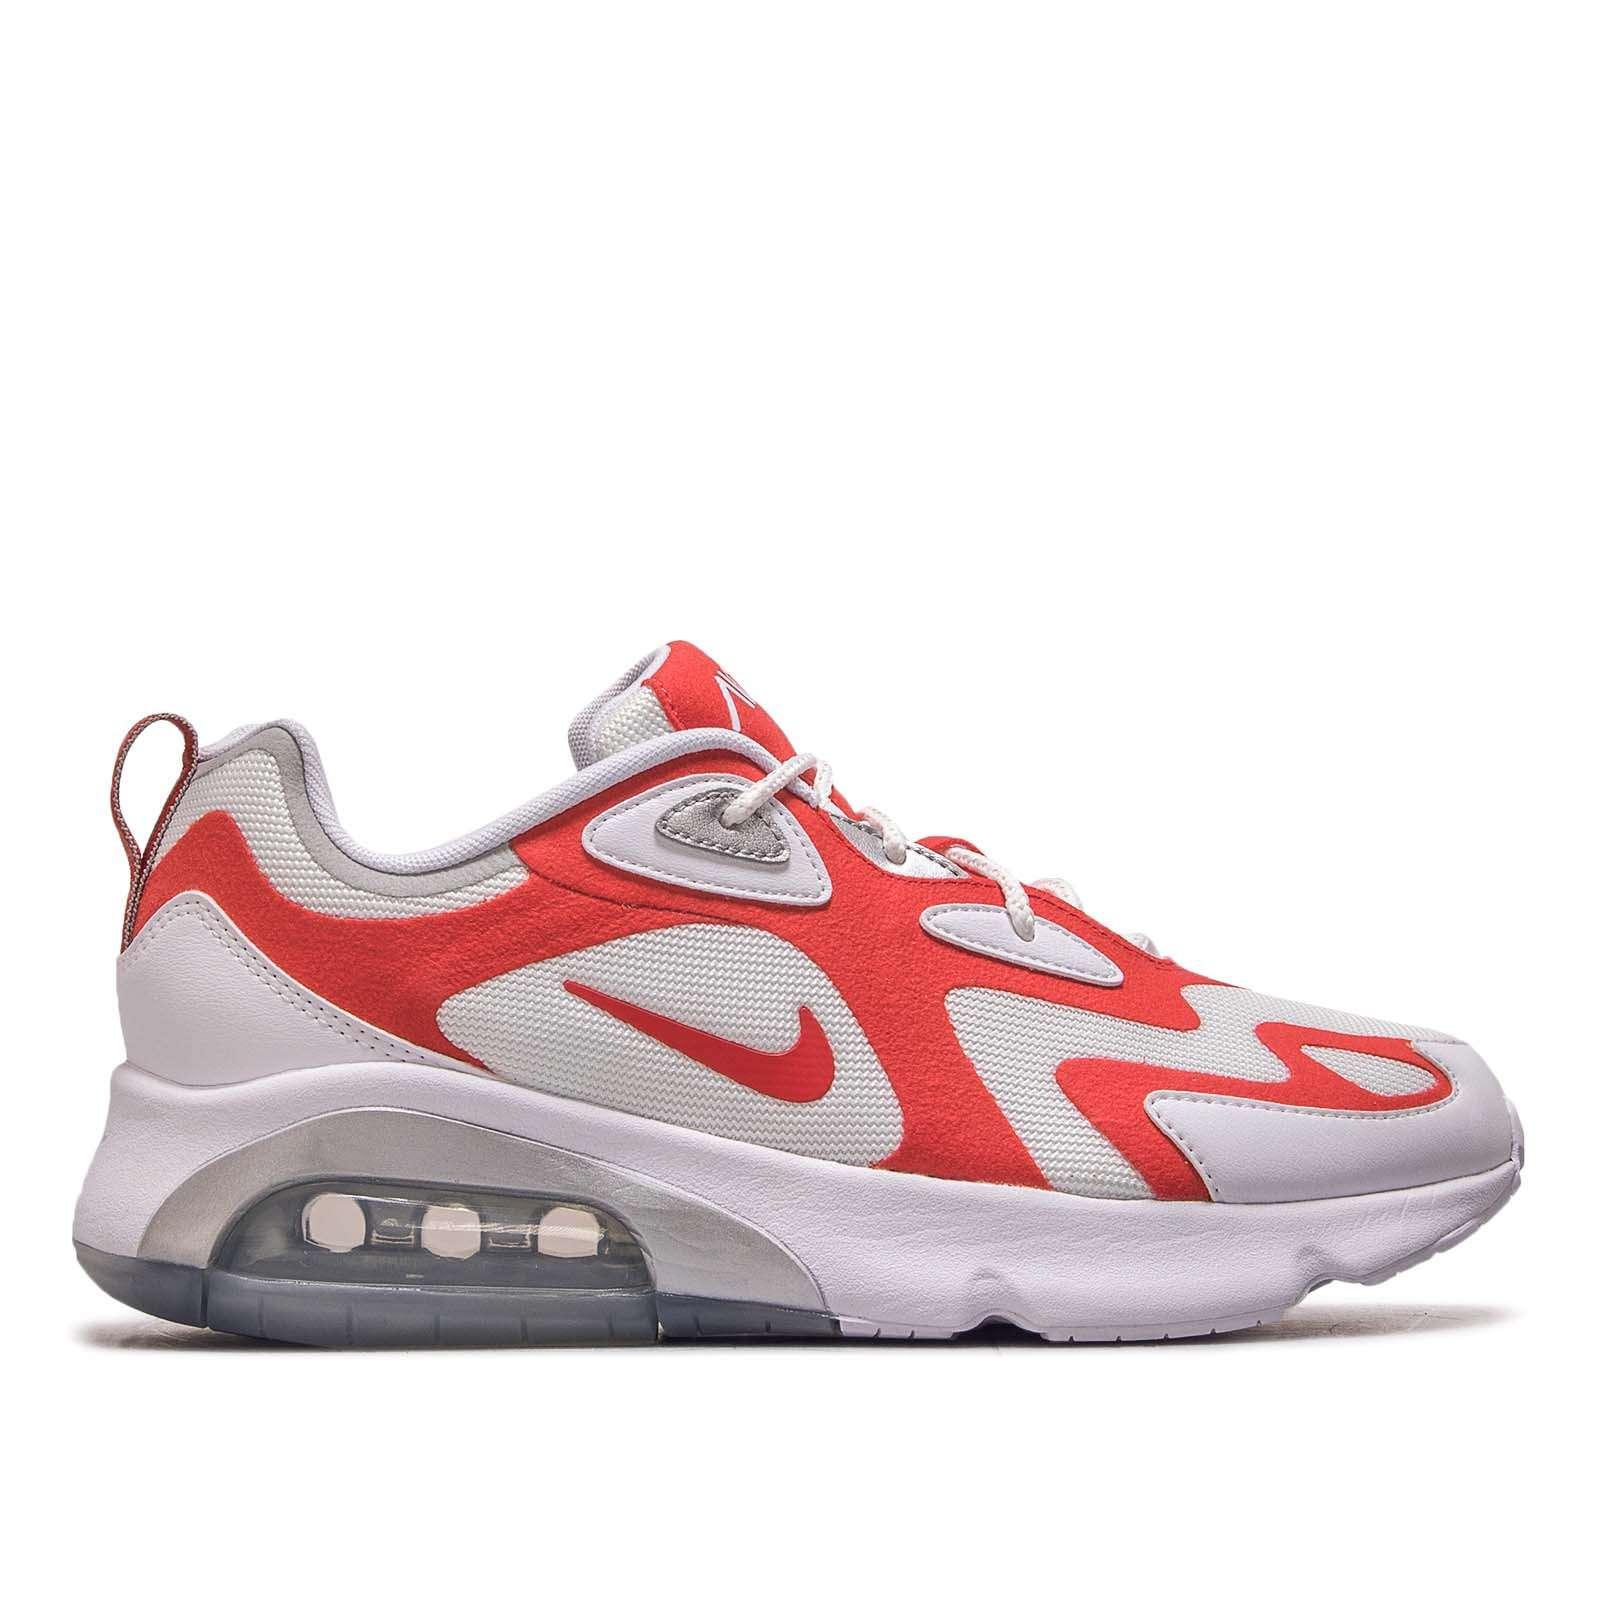 Herren Sneaker Air Max 200 White Red